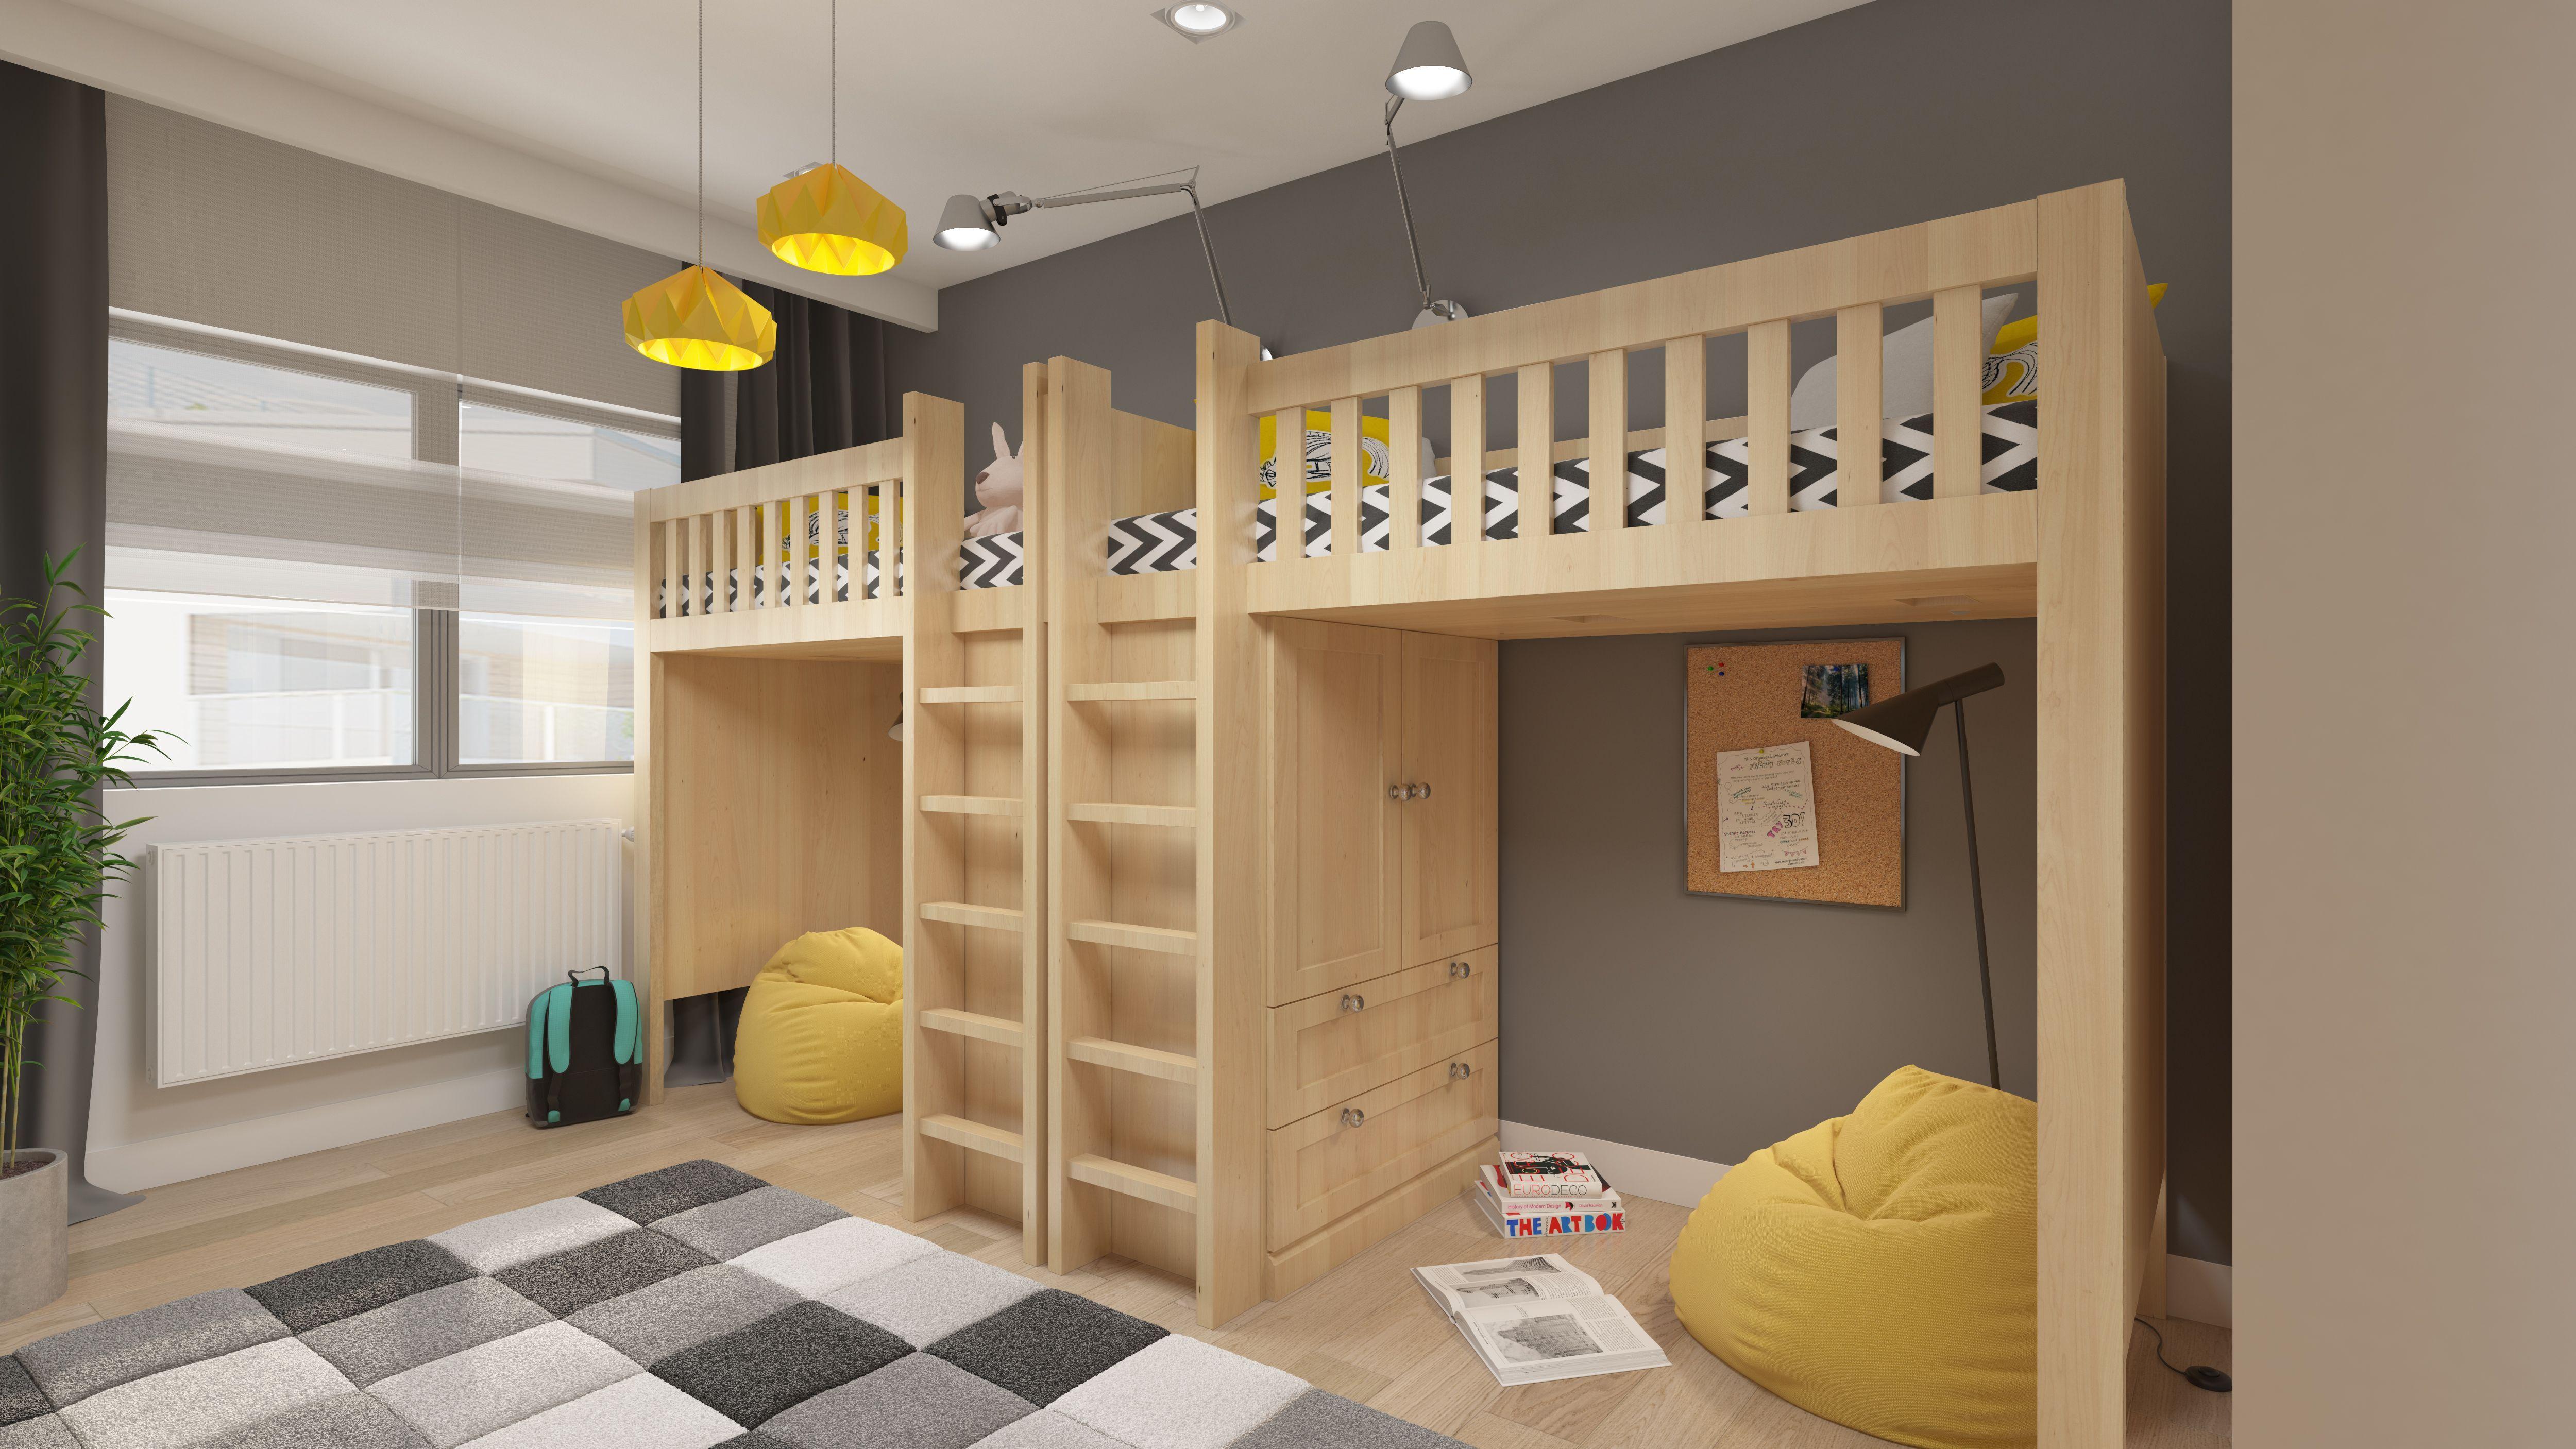 Boarding House Design Ideas Home Interior Design Cool House